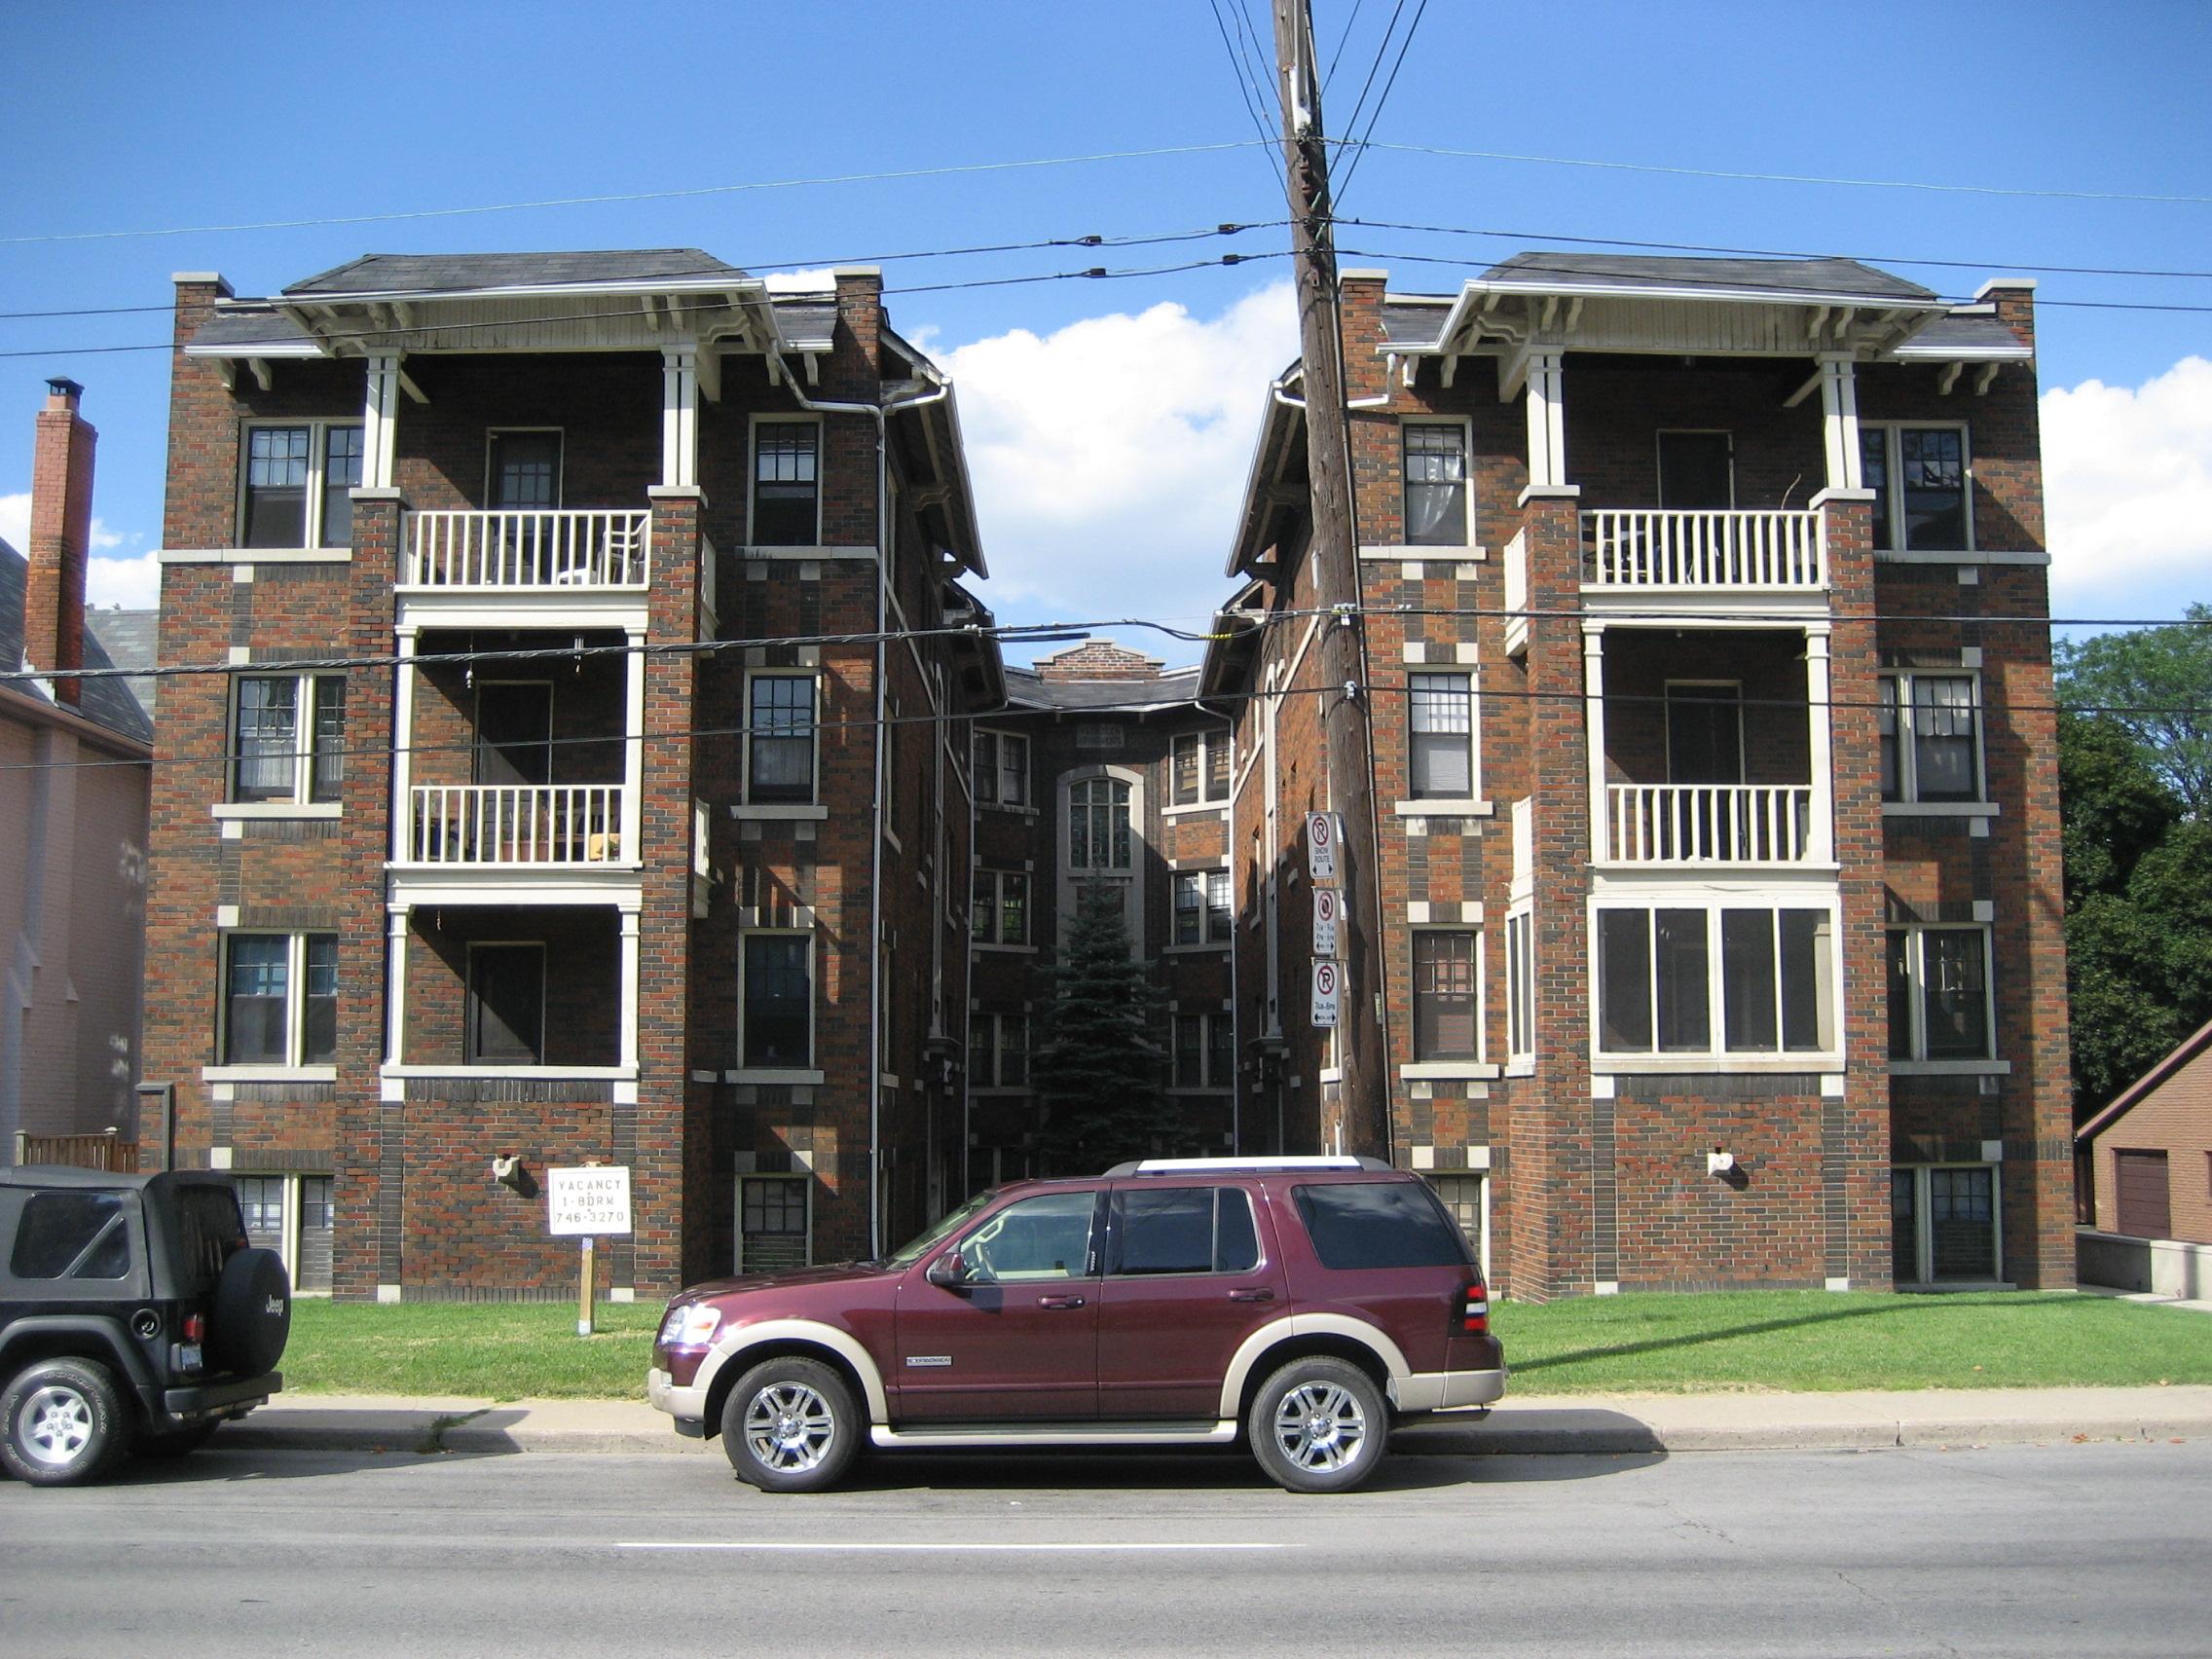 Charming File:Aberdeen Apartments Hamilton.JPG